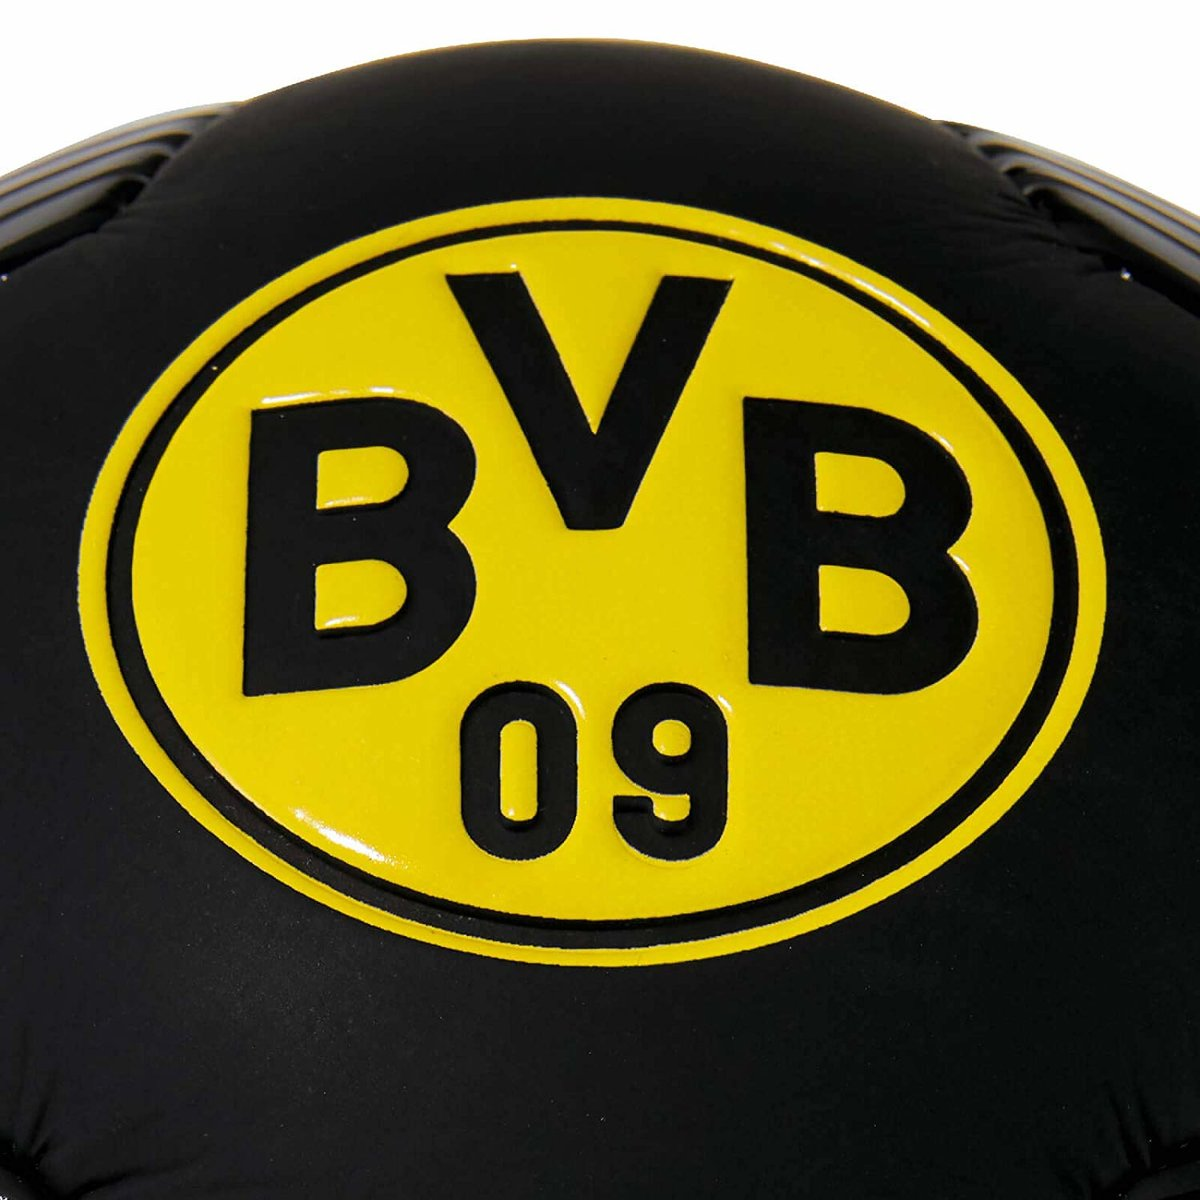 Bvb Hotline